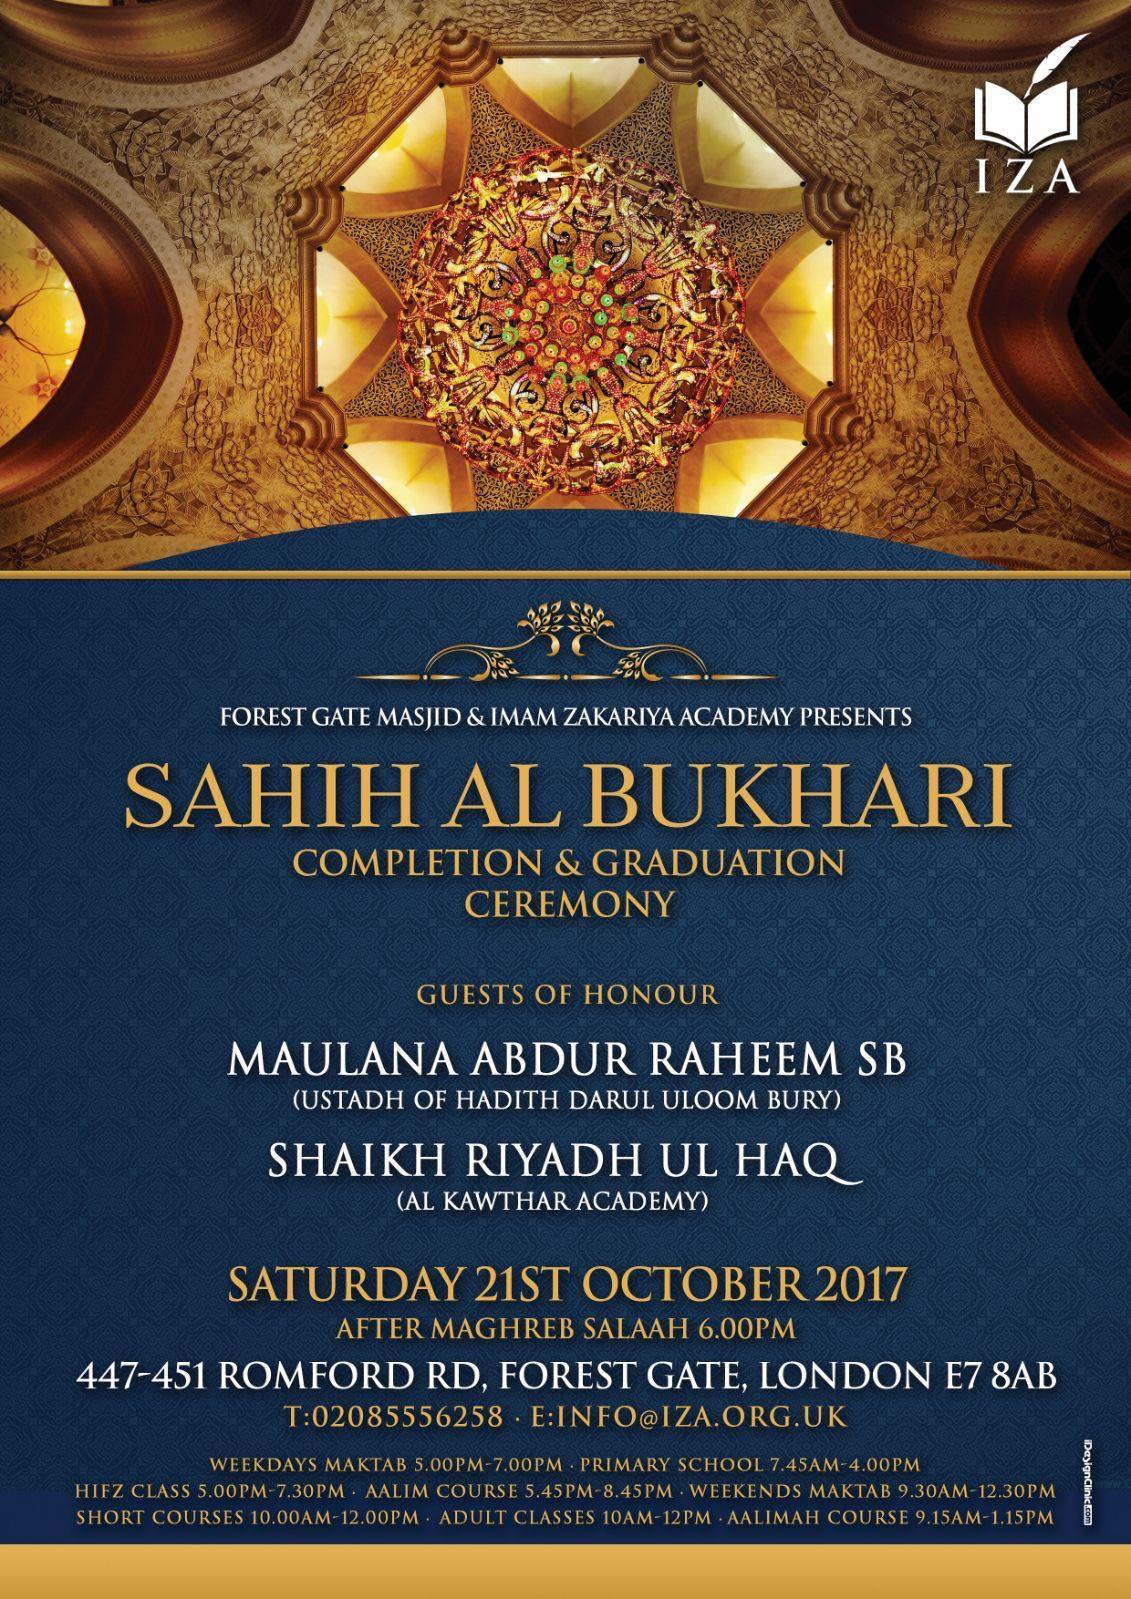 Sahih Al Bukhari Completion & Graduation Ceremony